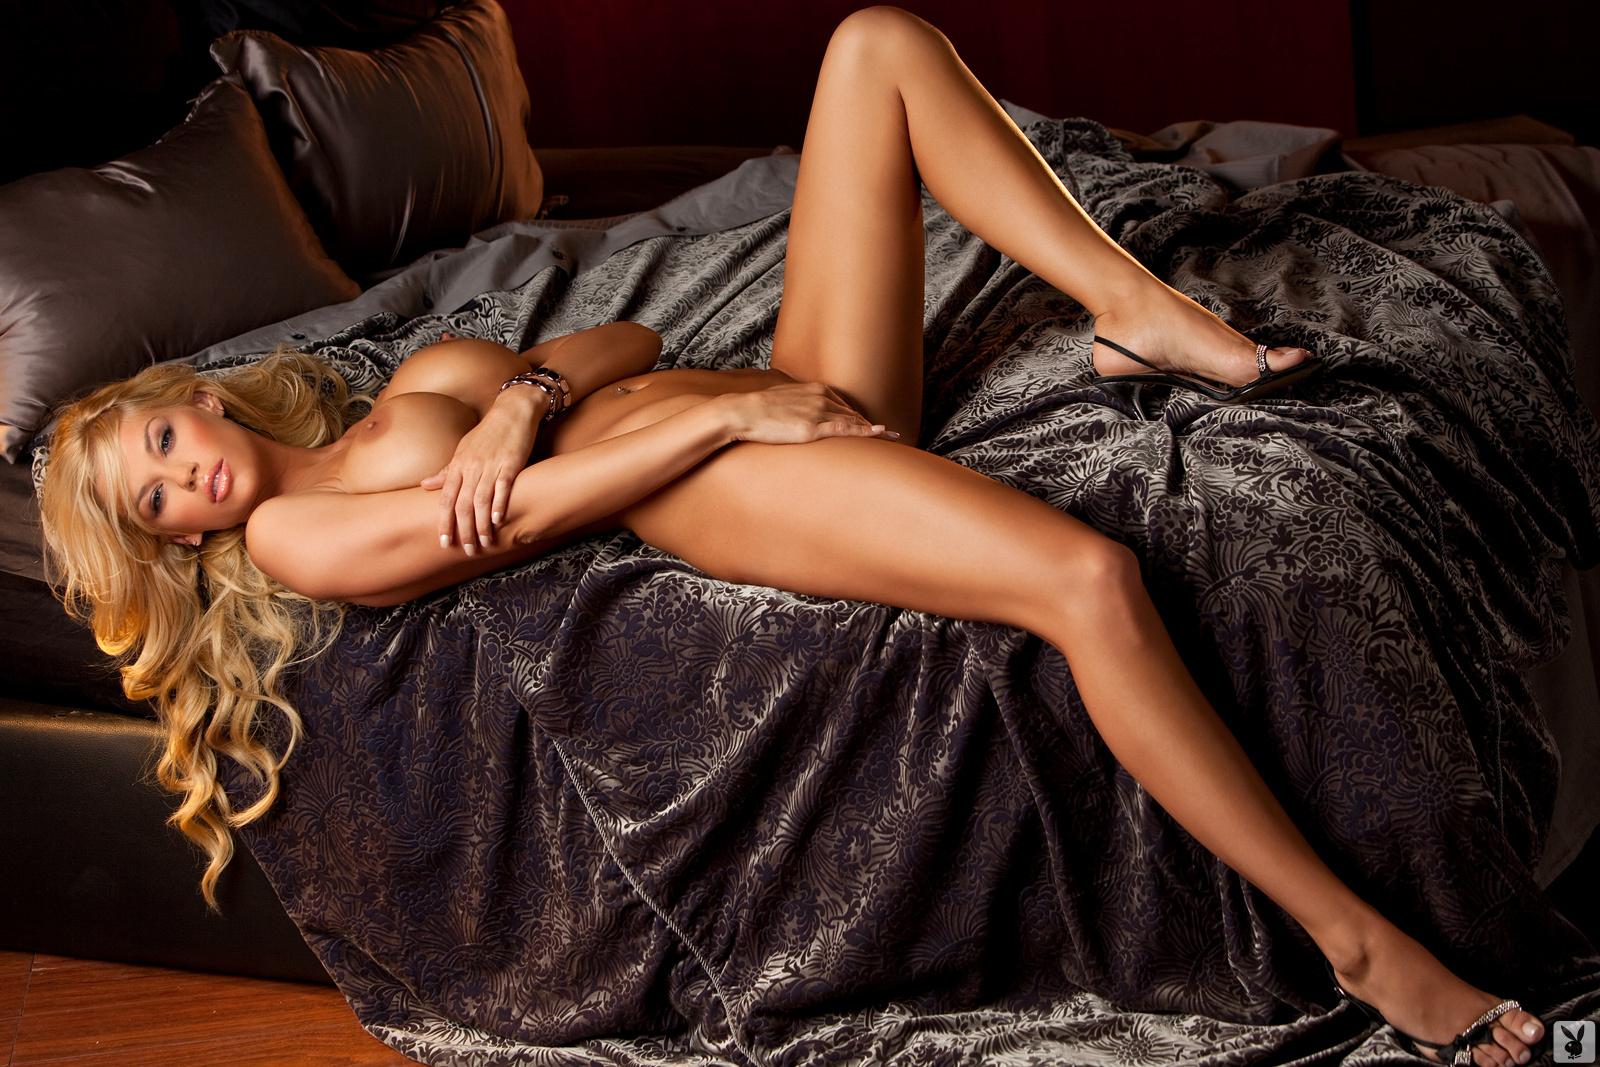 Erotic nude glamour girls, big tits choking sex